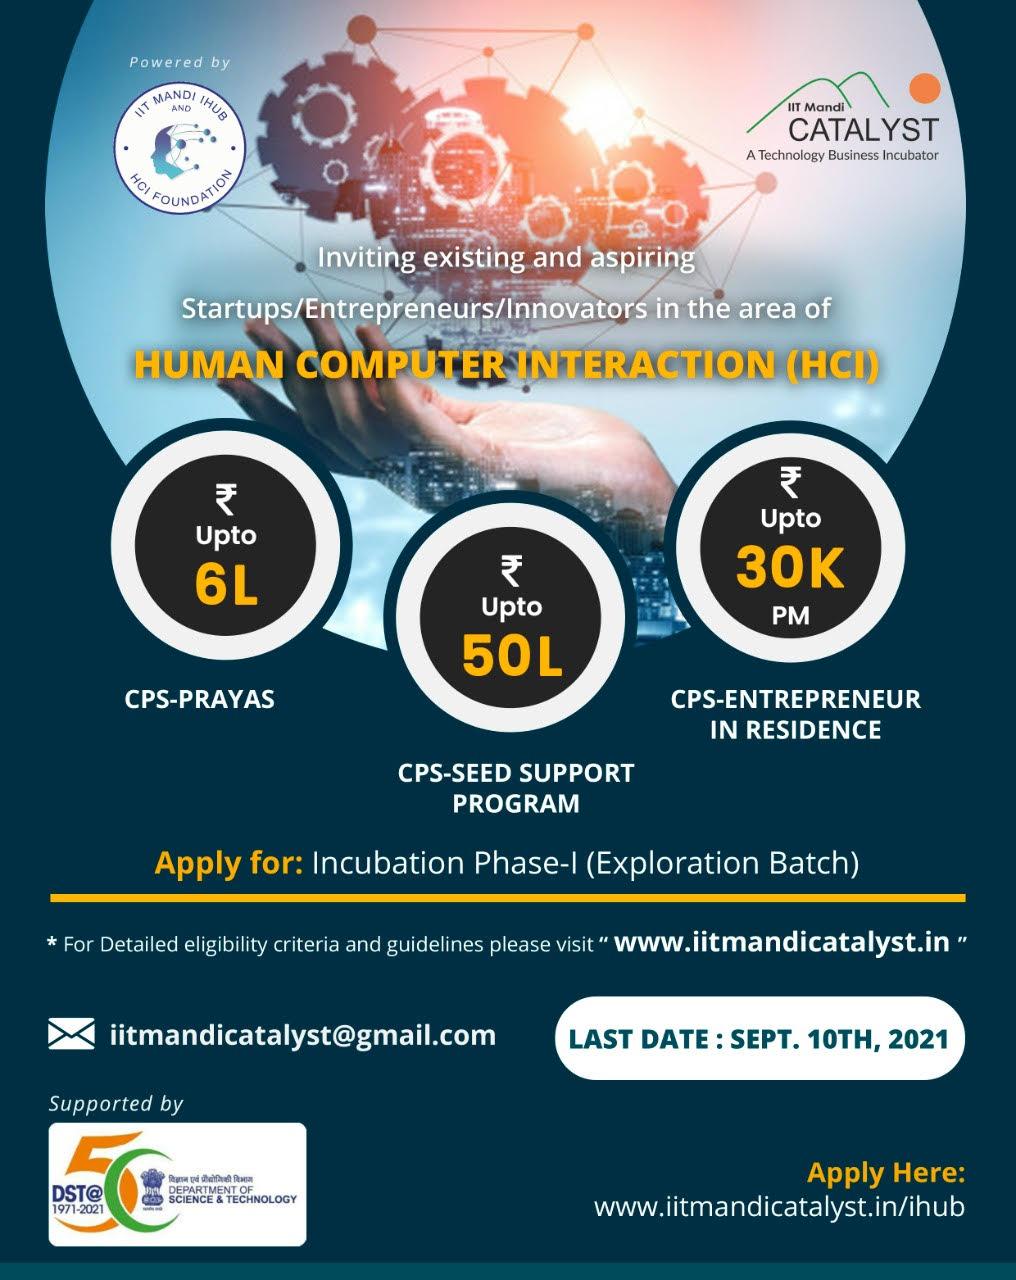 Human Computer Interaction (HCI) - IIT Mandi